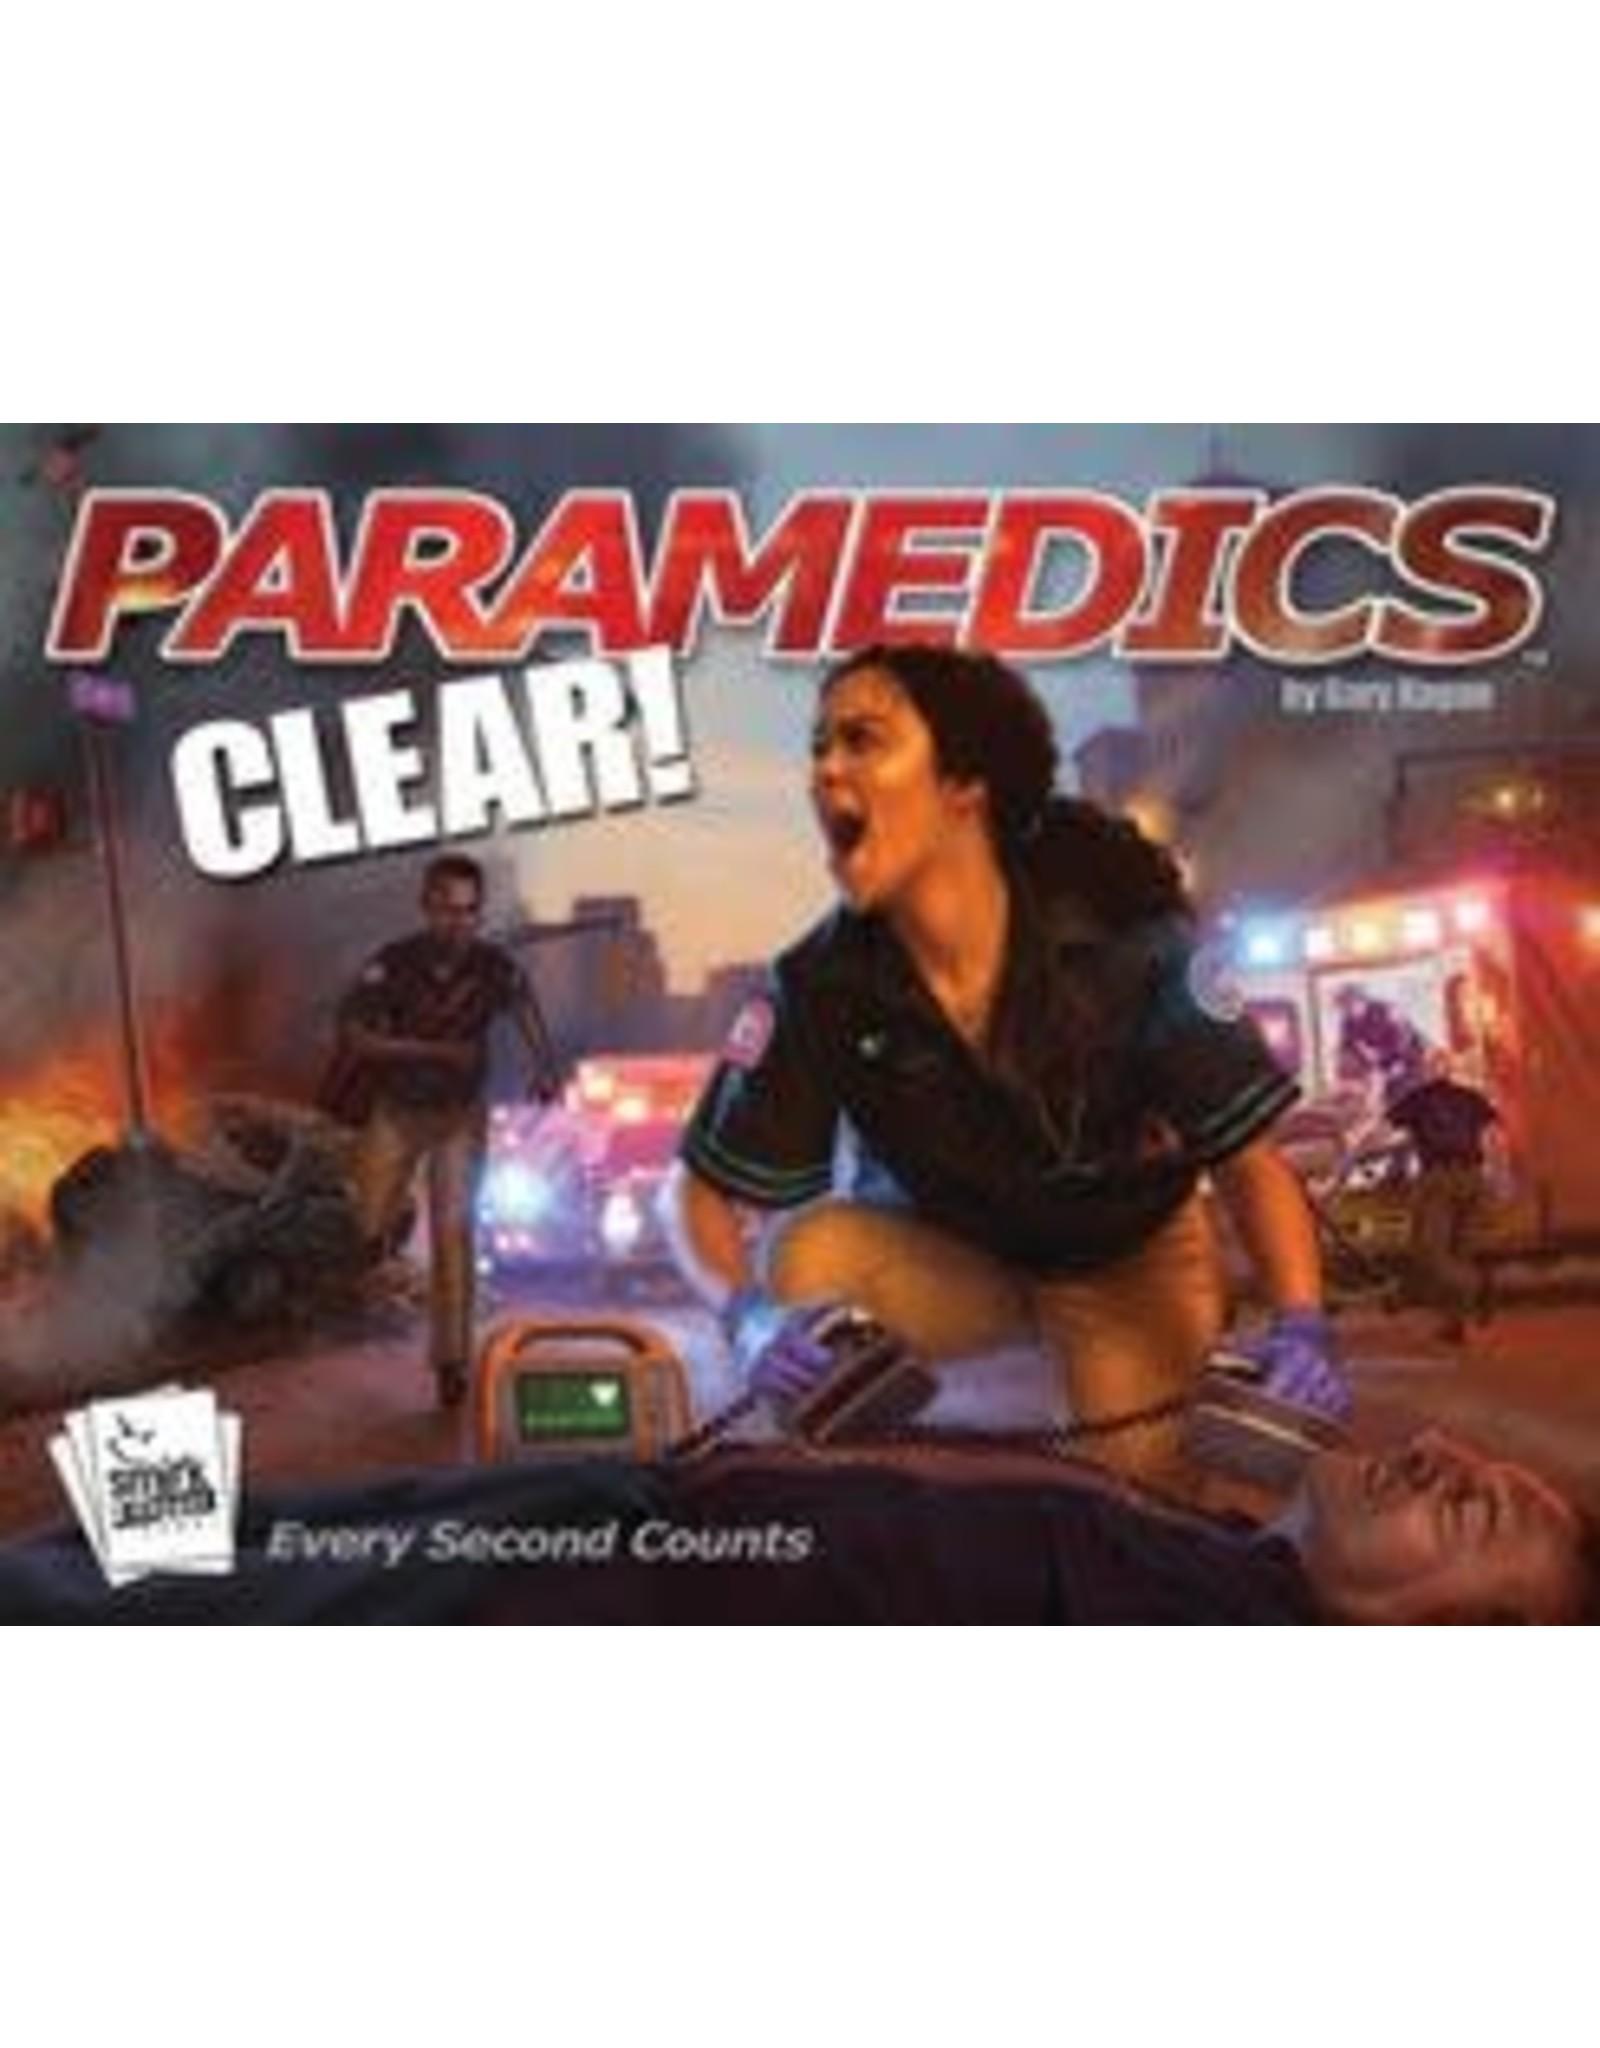 Paramedics: Clear! Board Game